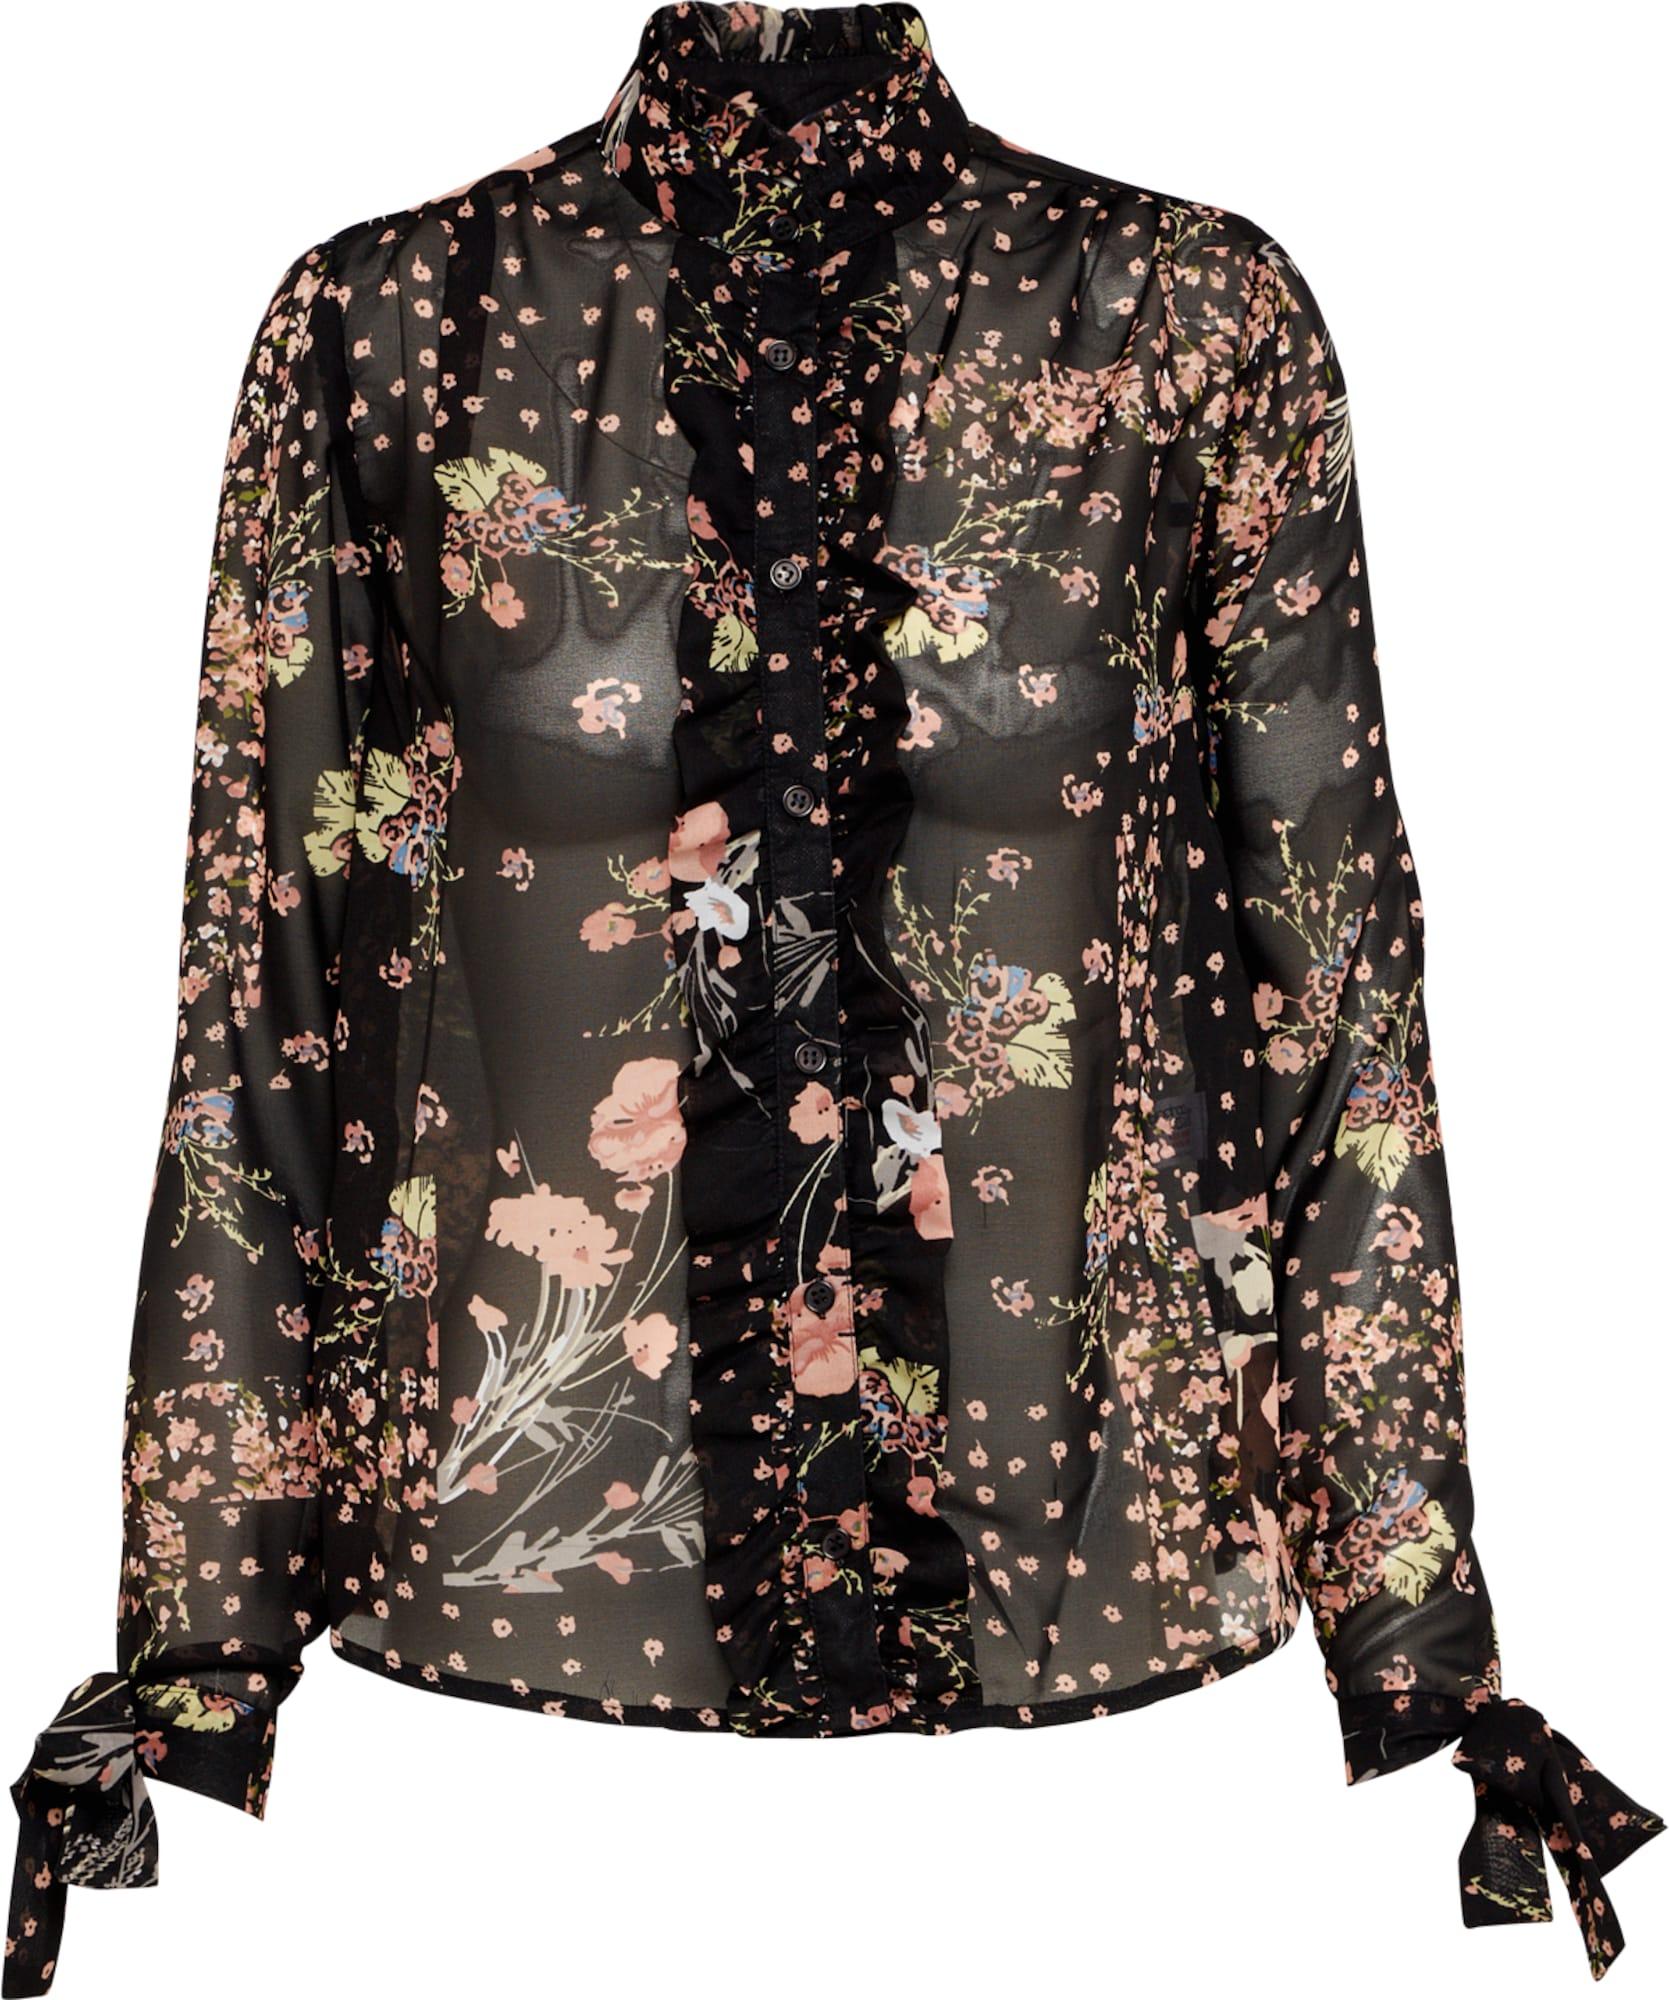 boohoo bluse mit blumen print in schwarz about you. Black Bedroom Furniture Sets. Home Design Ideas